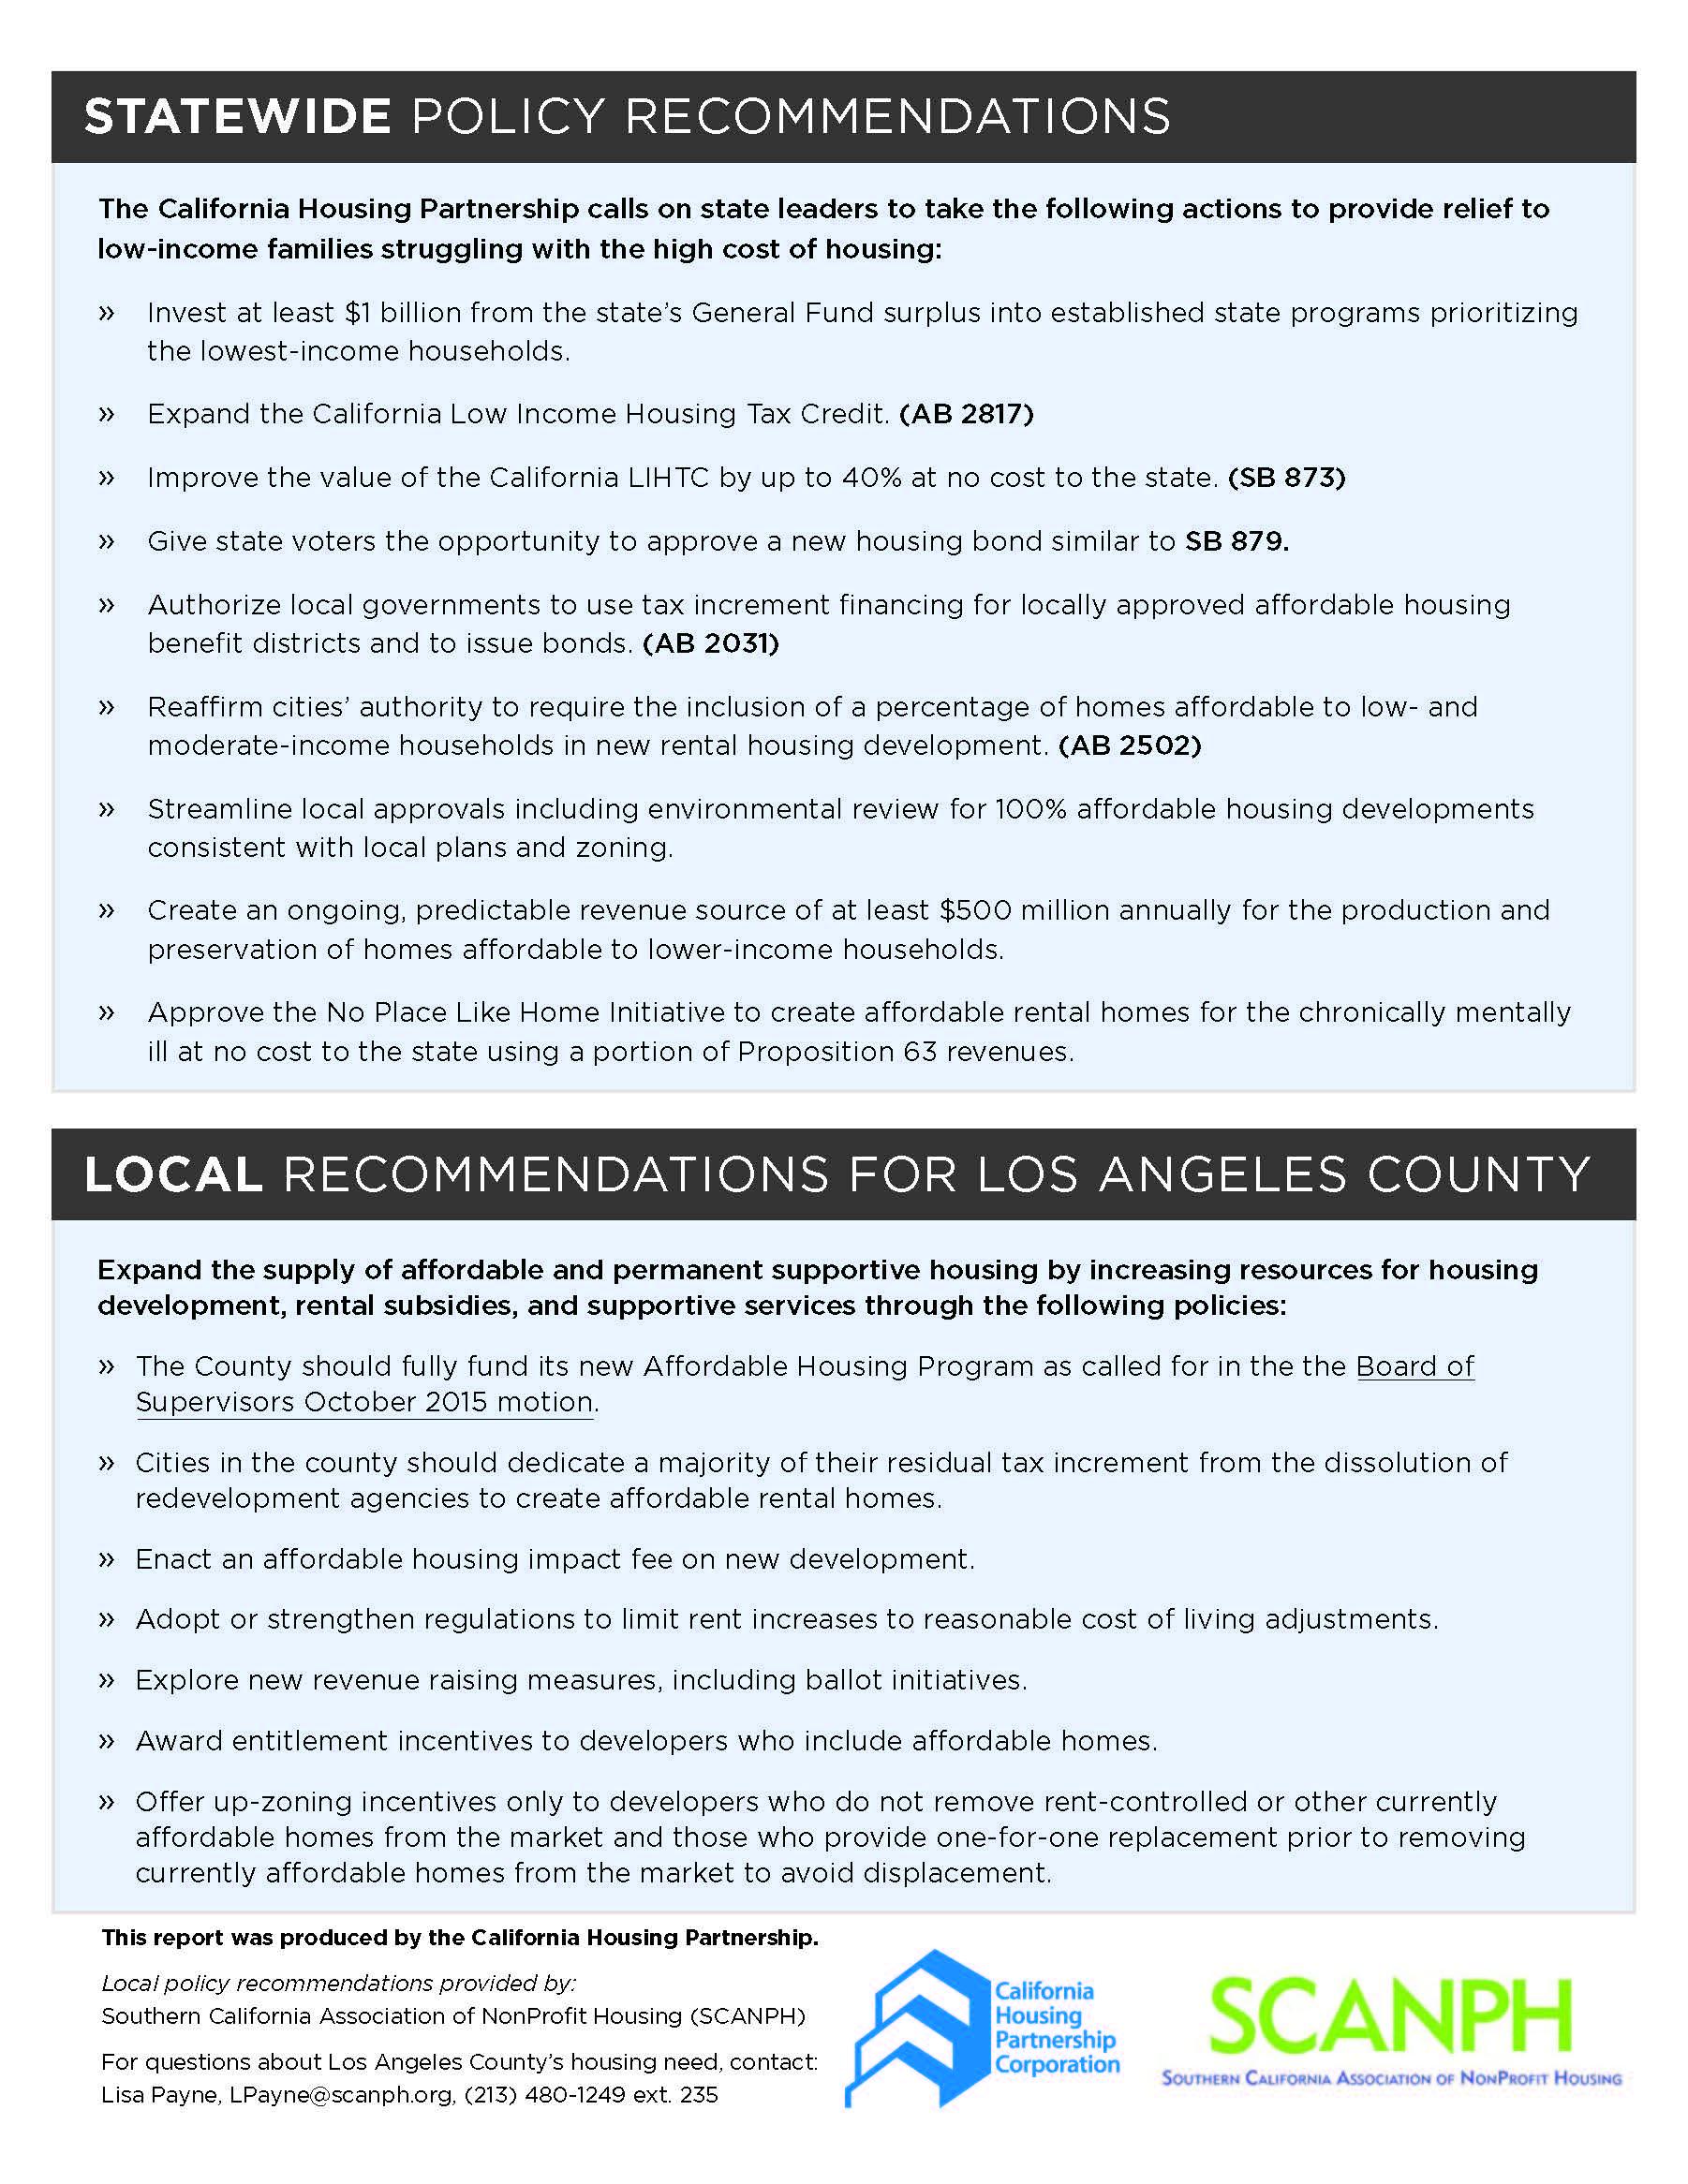 Los-Angeles-County_Part4.jpg